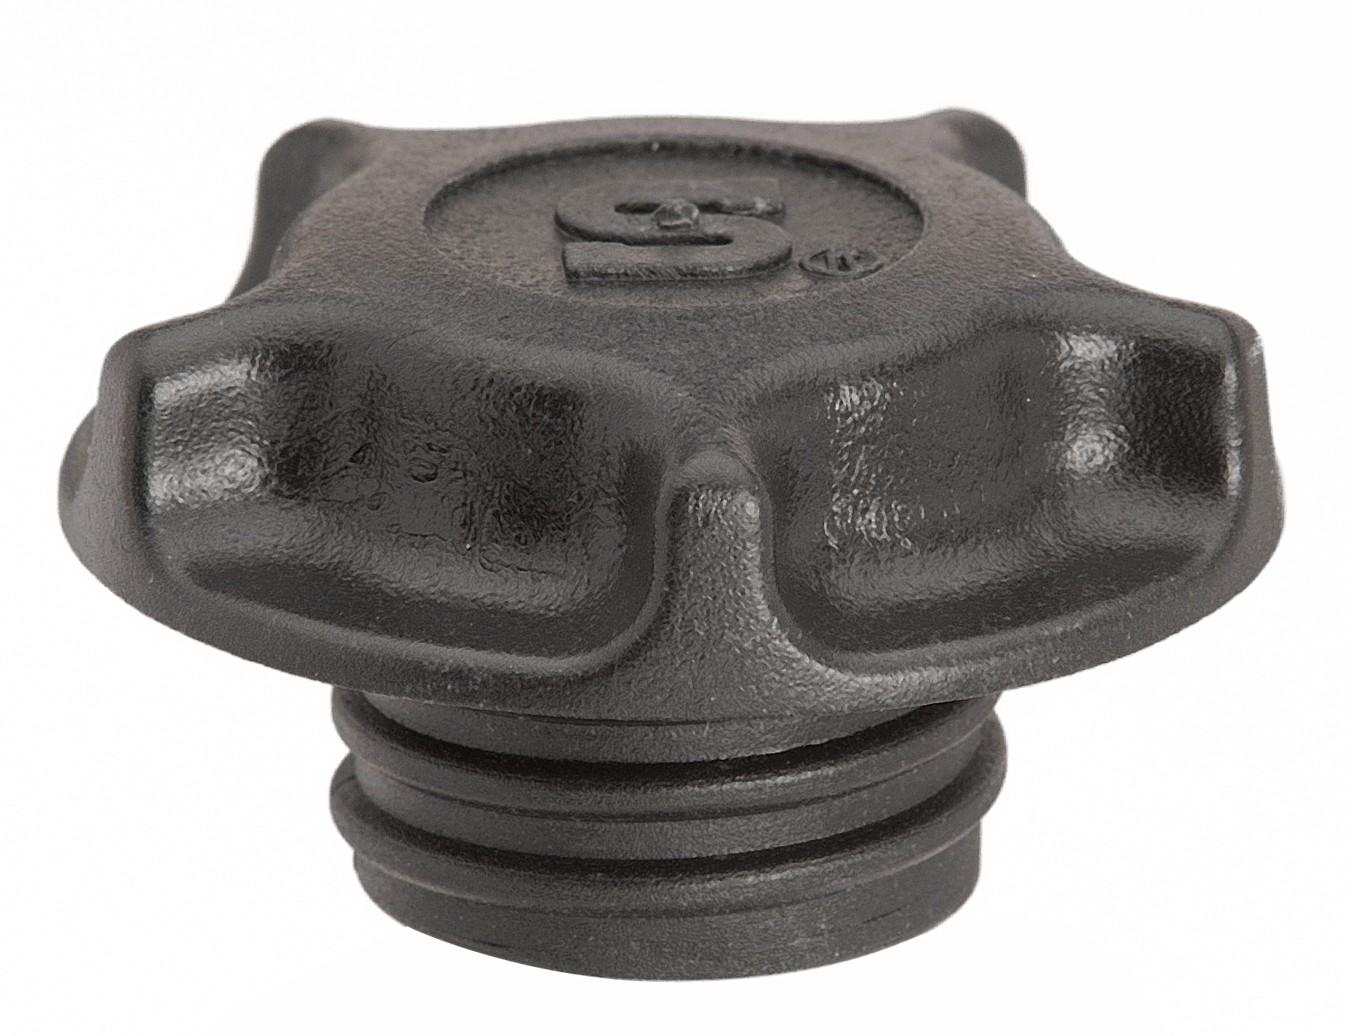 1991 Toyota Land Cruiser Engine Oil Filler Cap Stant 10112